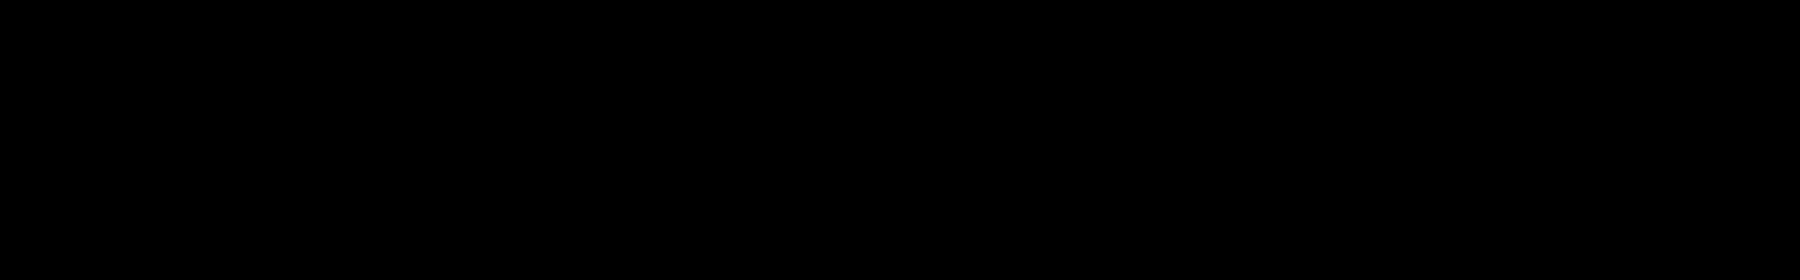 Ambient FX Loops audio waveform